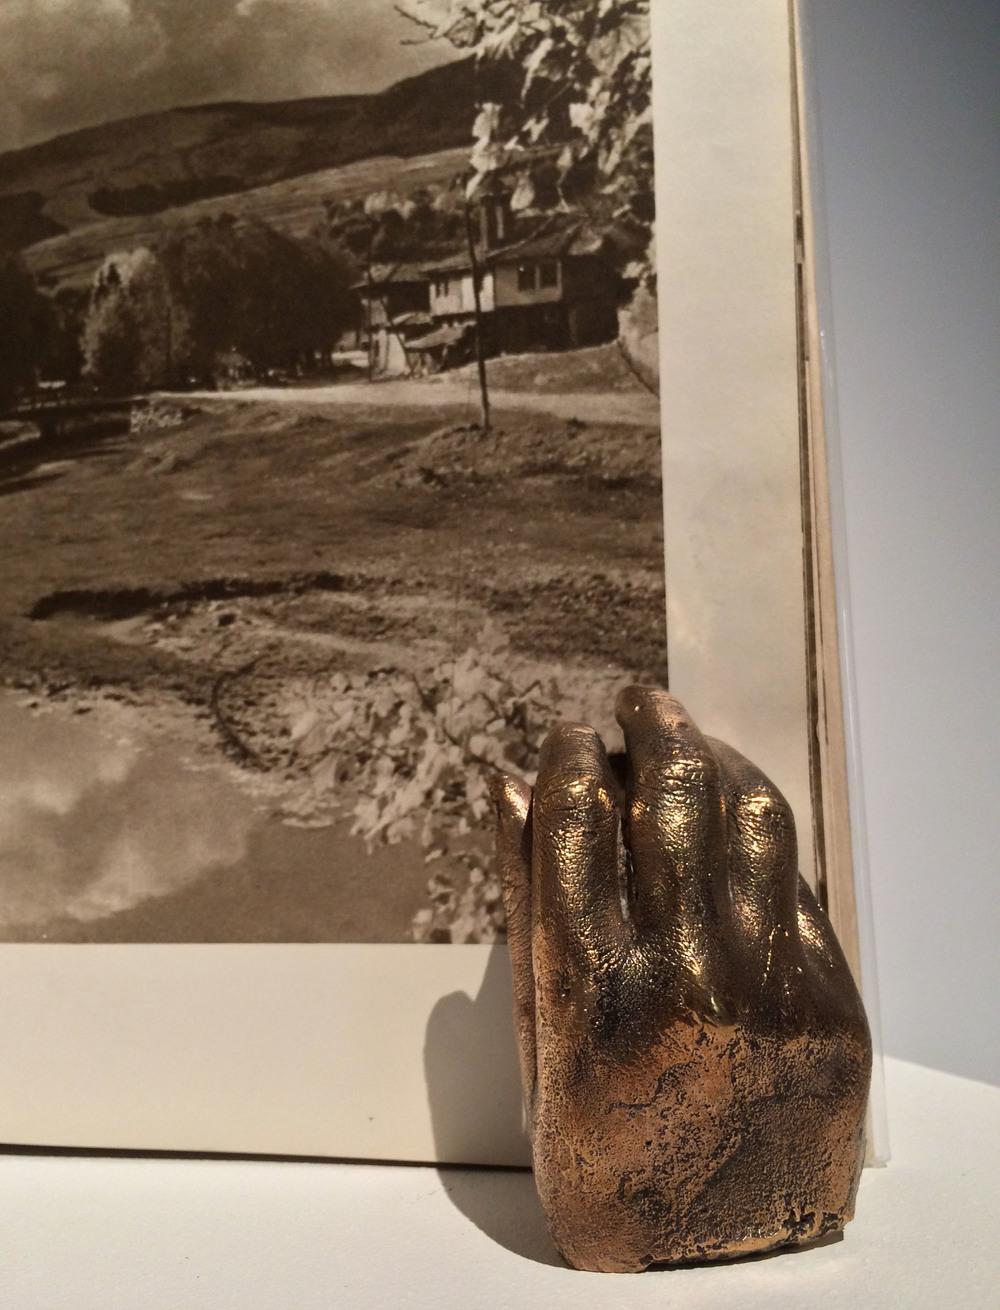 de mineralis mains ulysse bronze .jpg